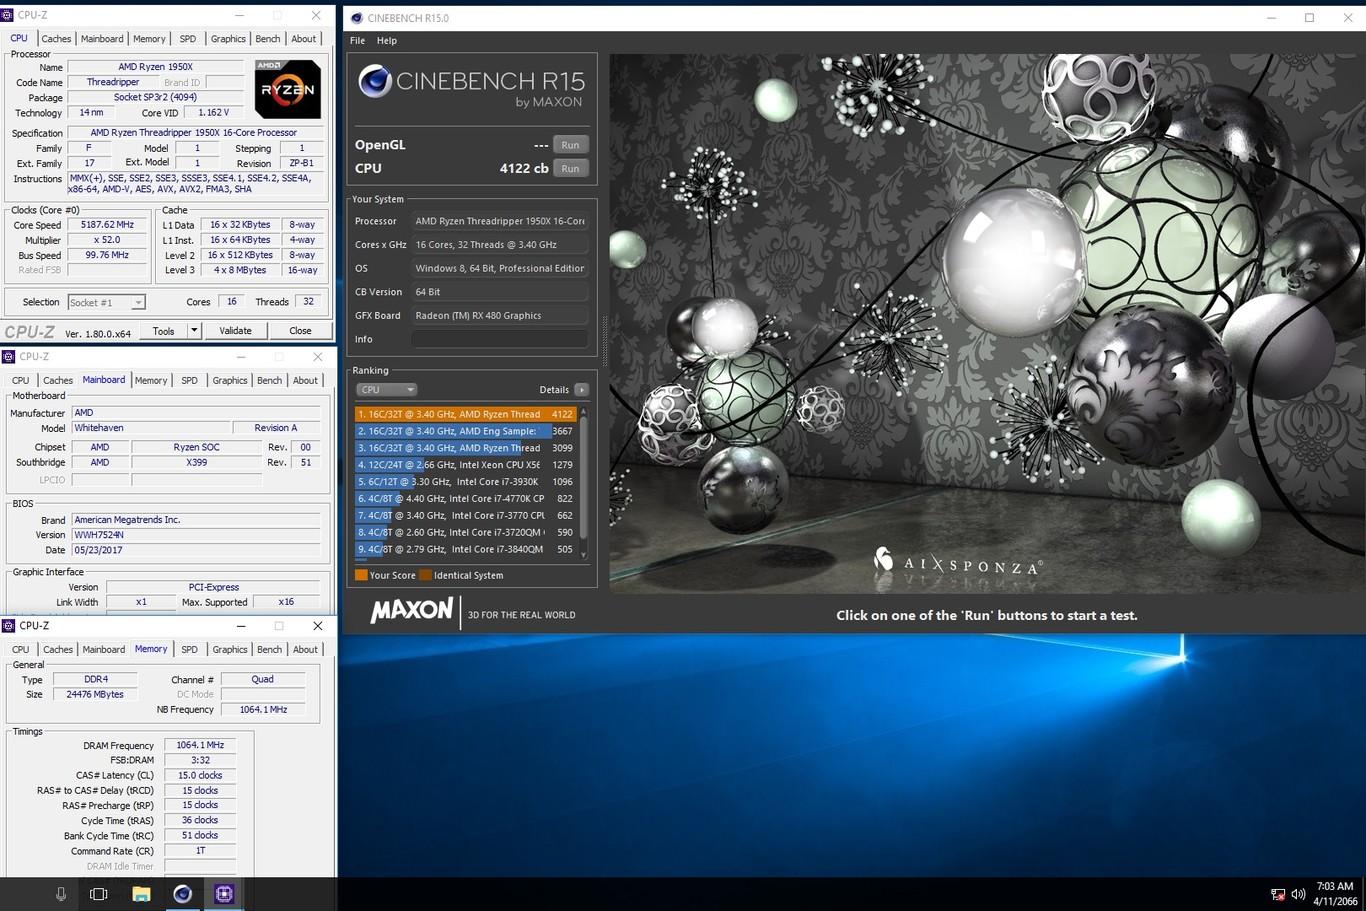 Hilo oficial] AMD Ryzen [Series 1000/2000, excepto